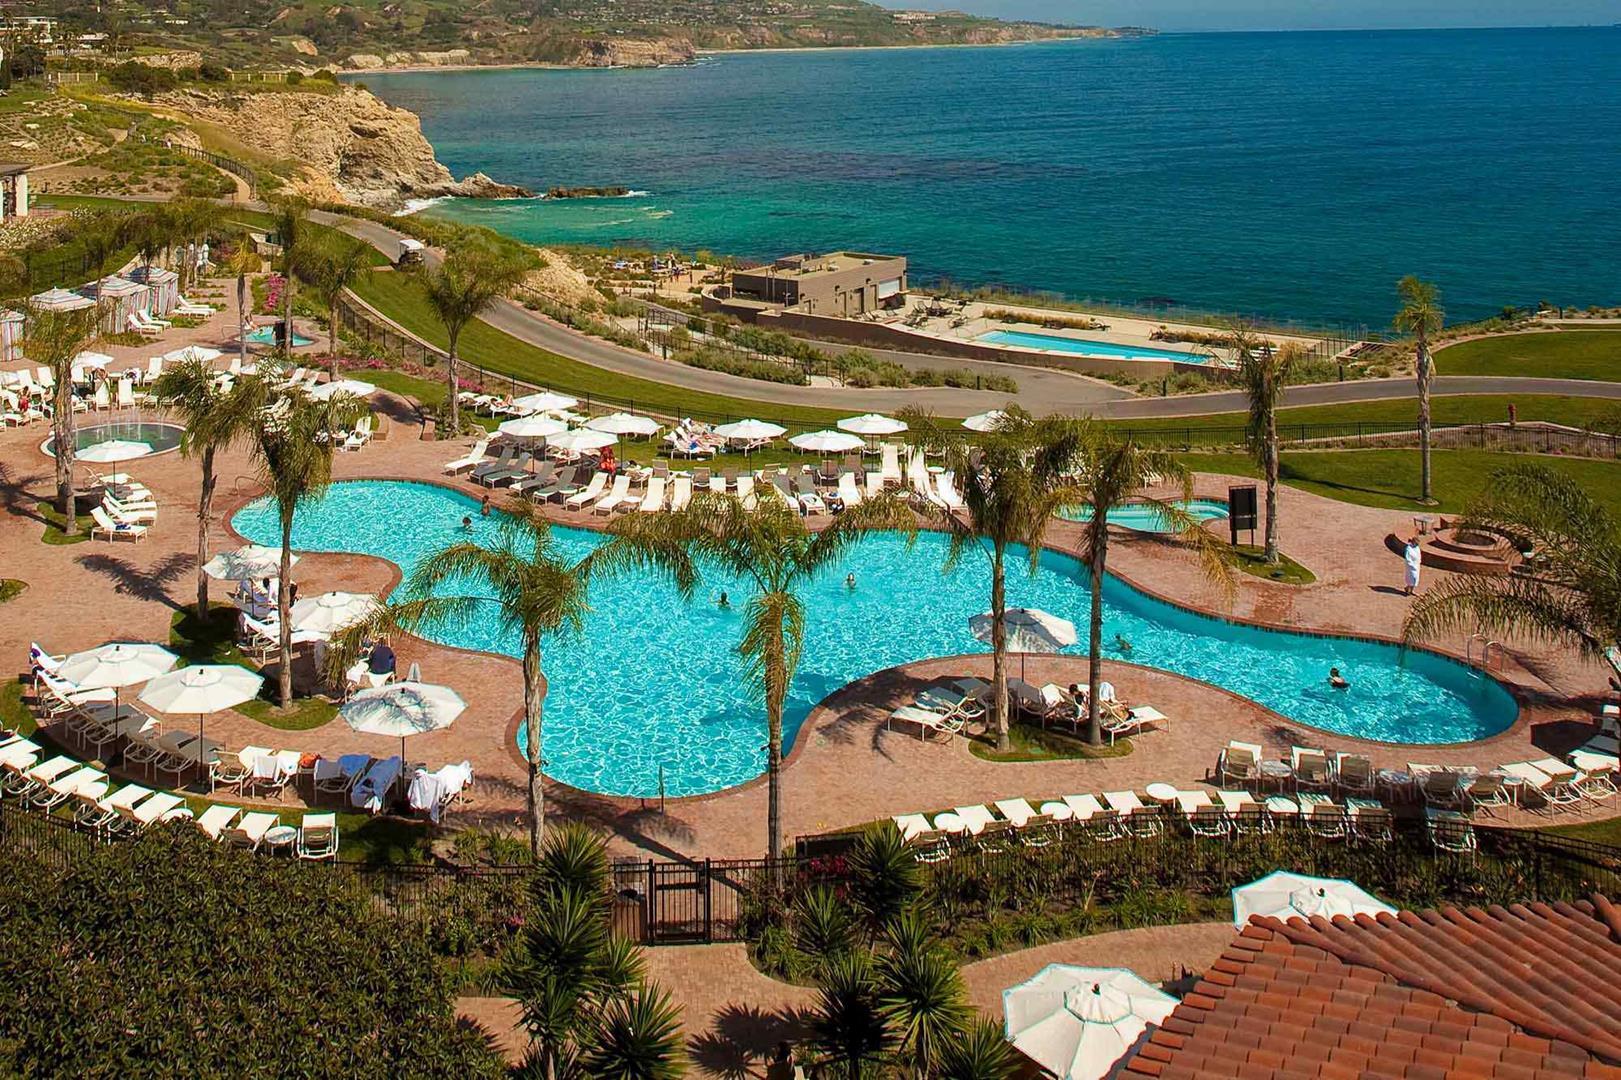 10 Breathtaking Beach Resorts on the West Coast